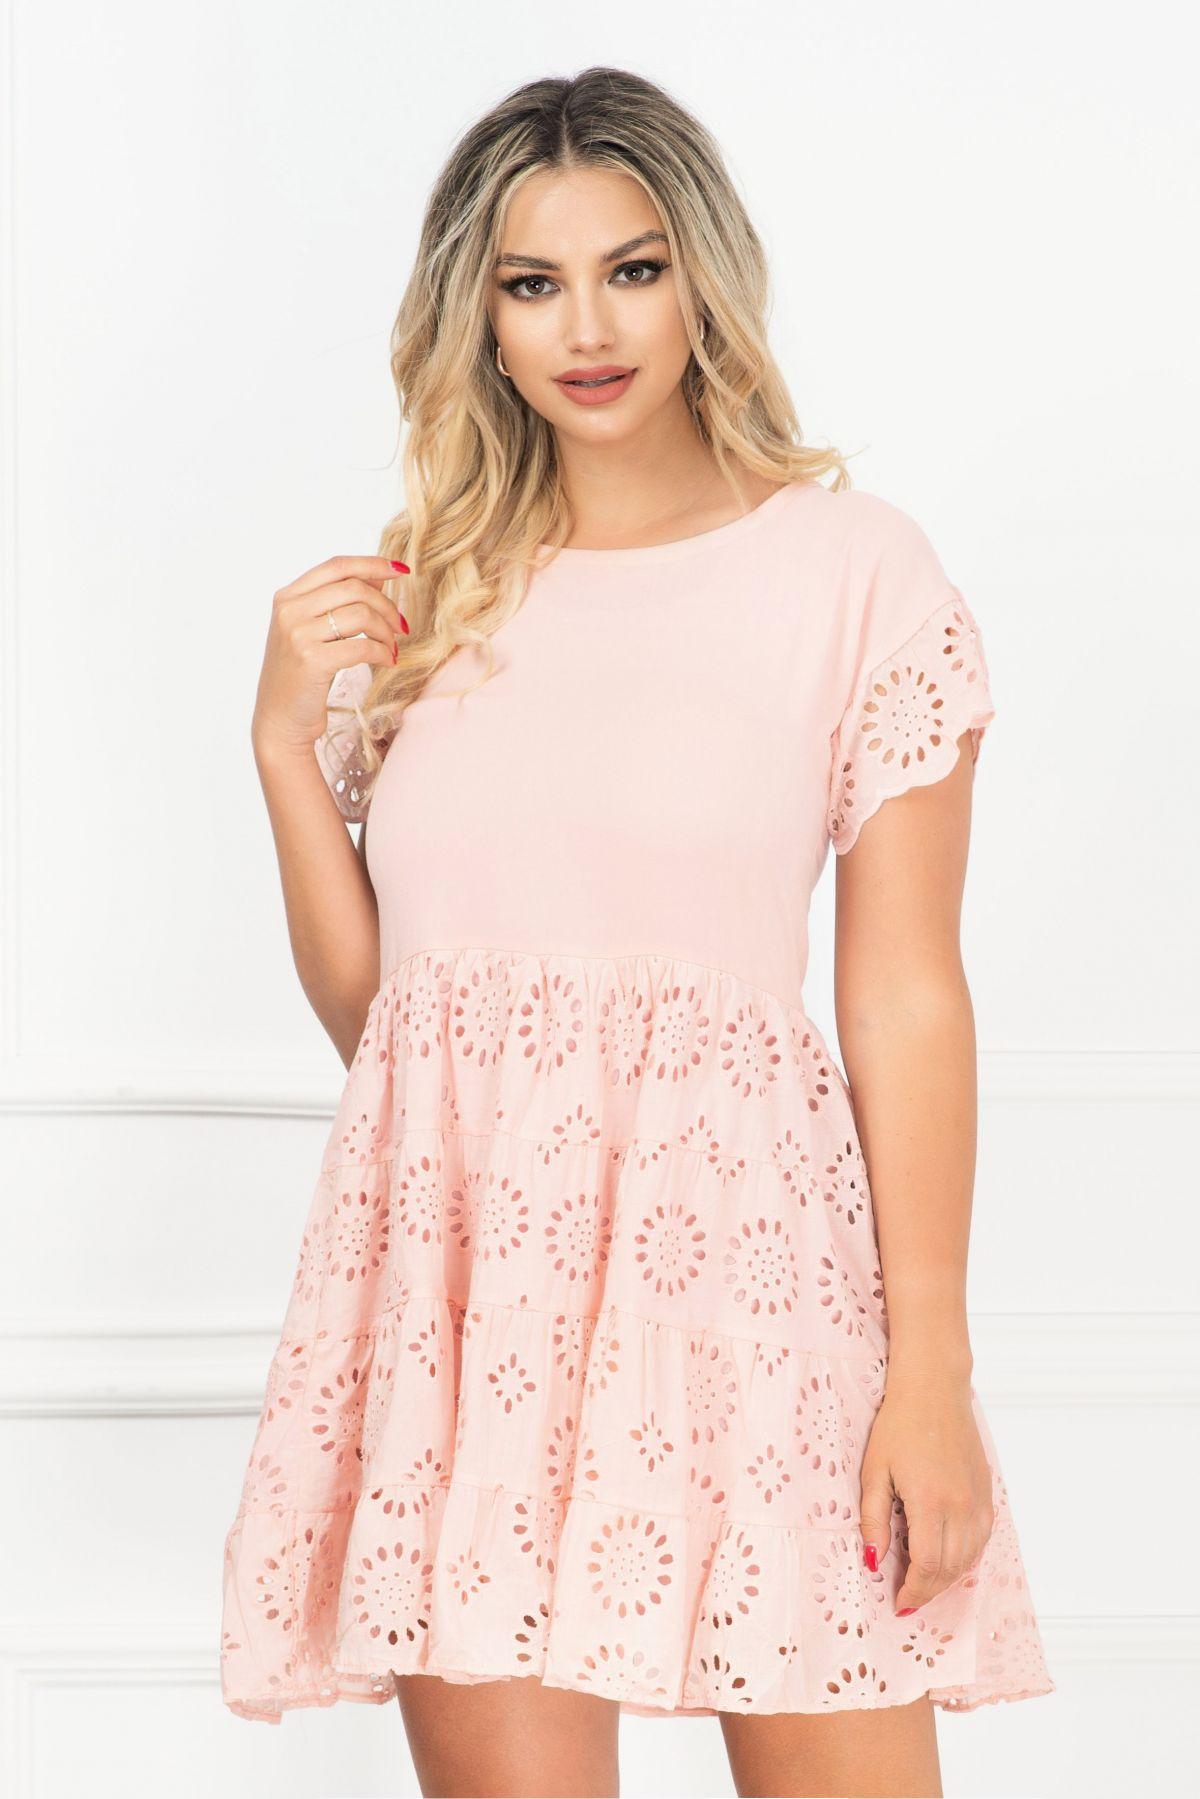 Rochie de vara roz lejera cu broderie englezeasca